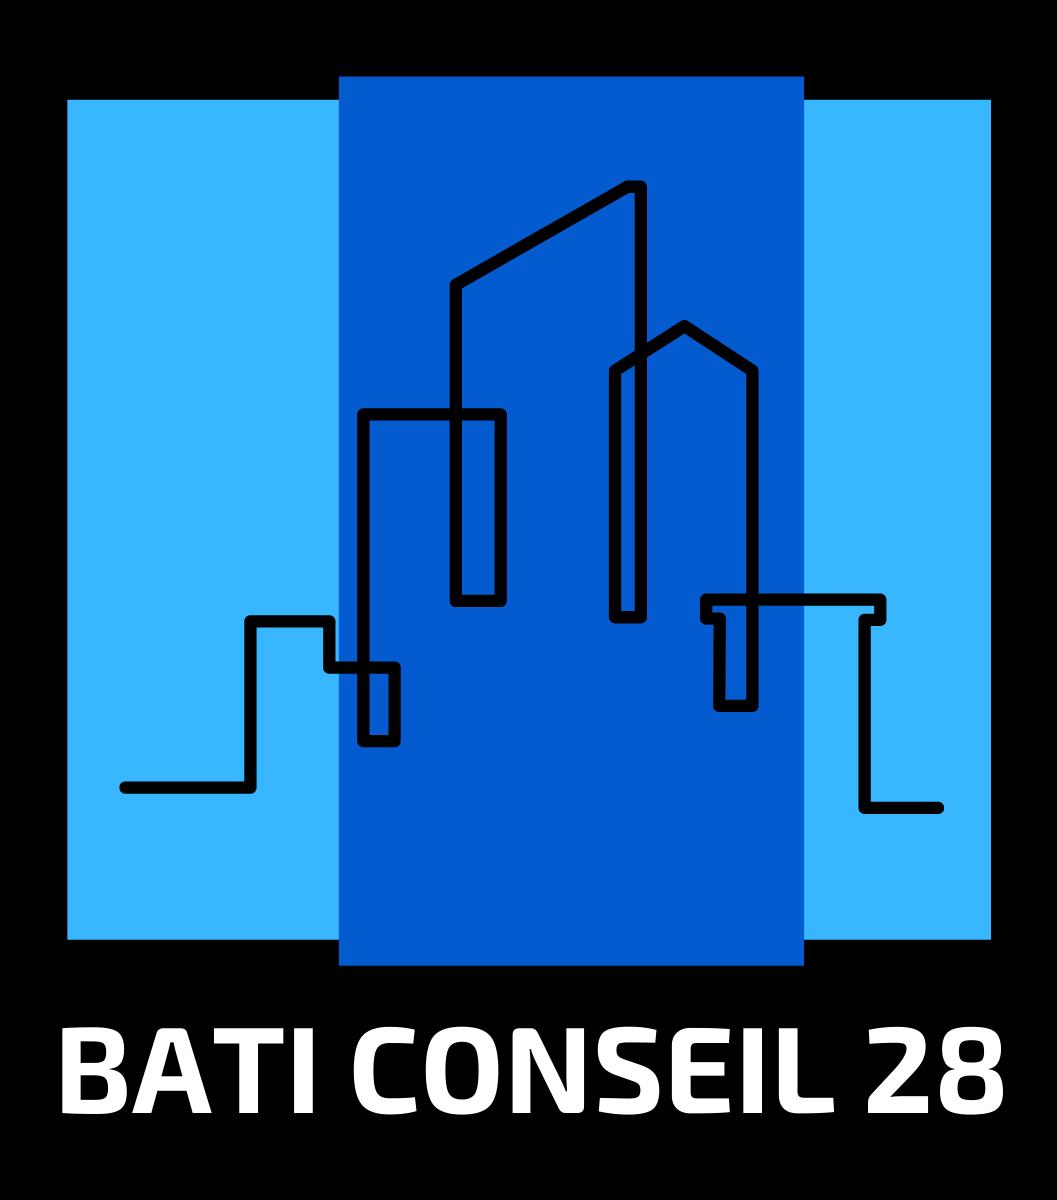 BATICONSEIL28